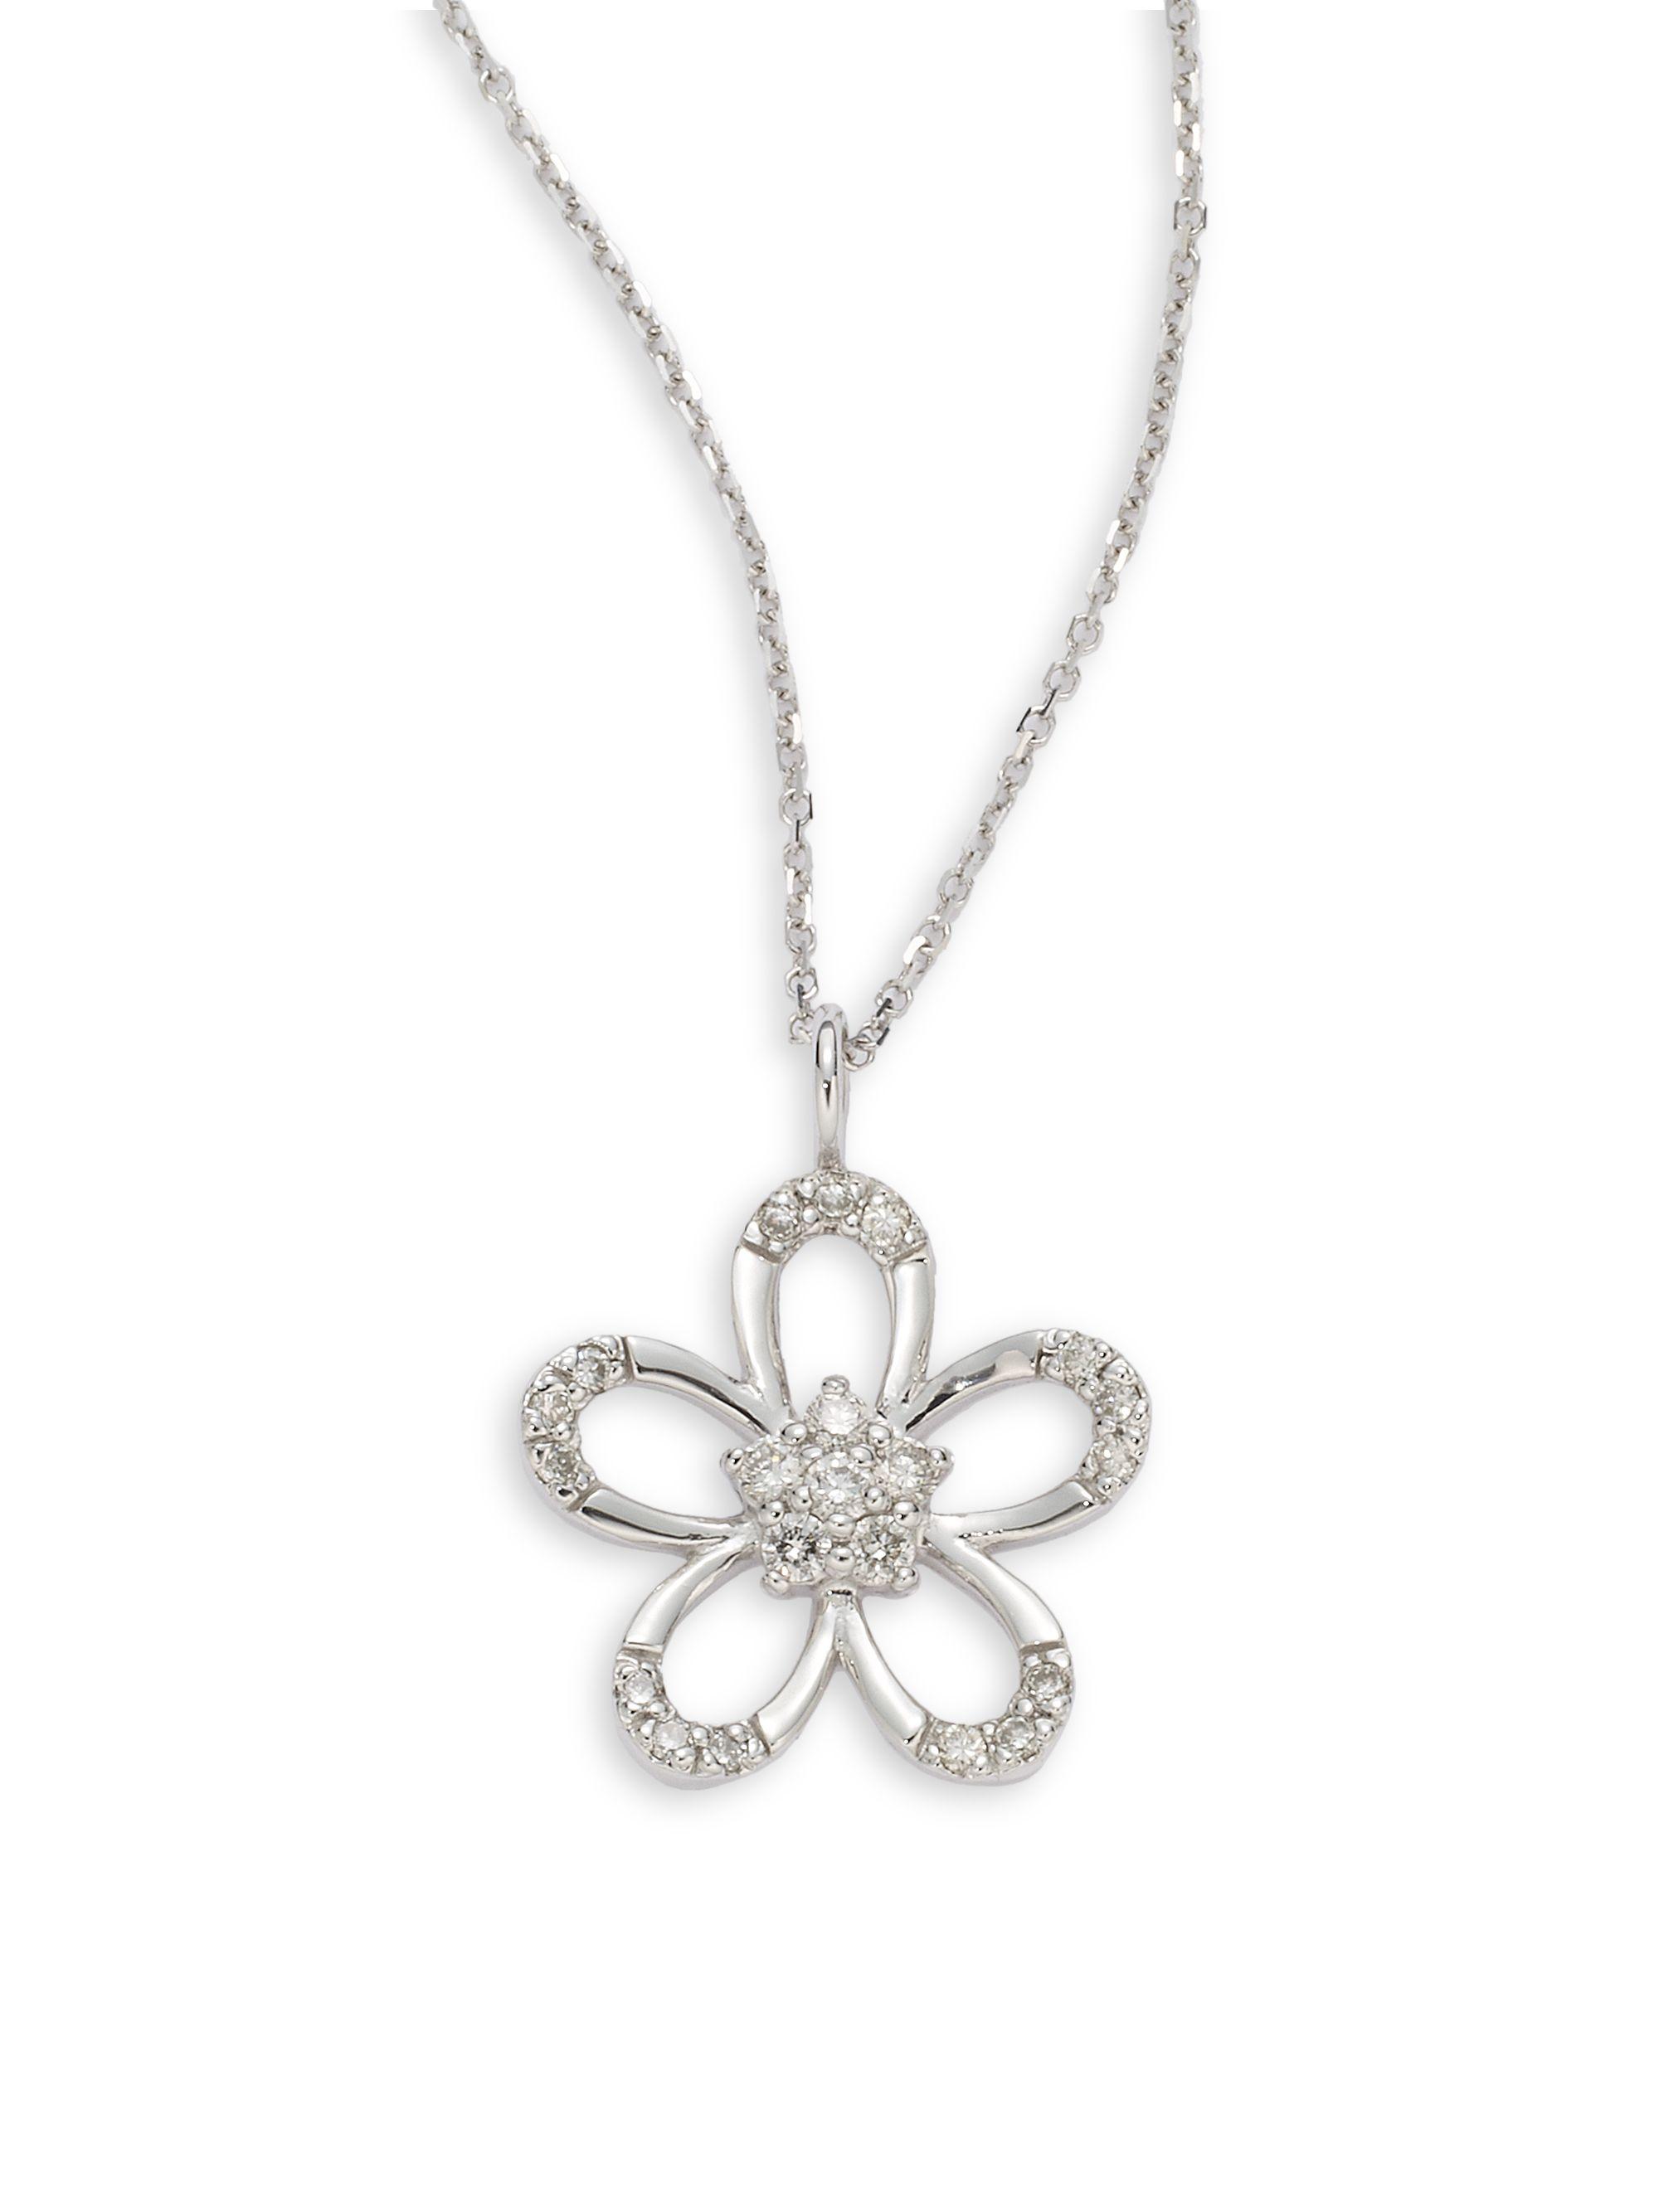 Kc Designs Diamond Open Flower Pendant Necklace In Silver